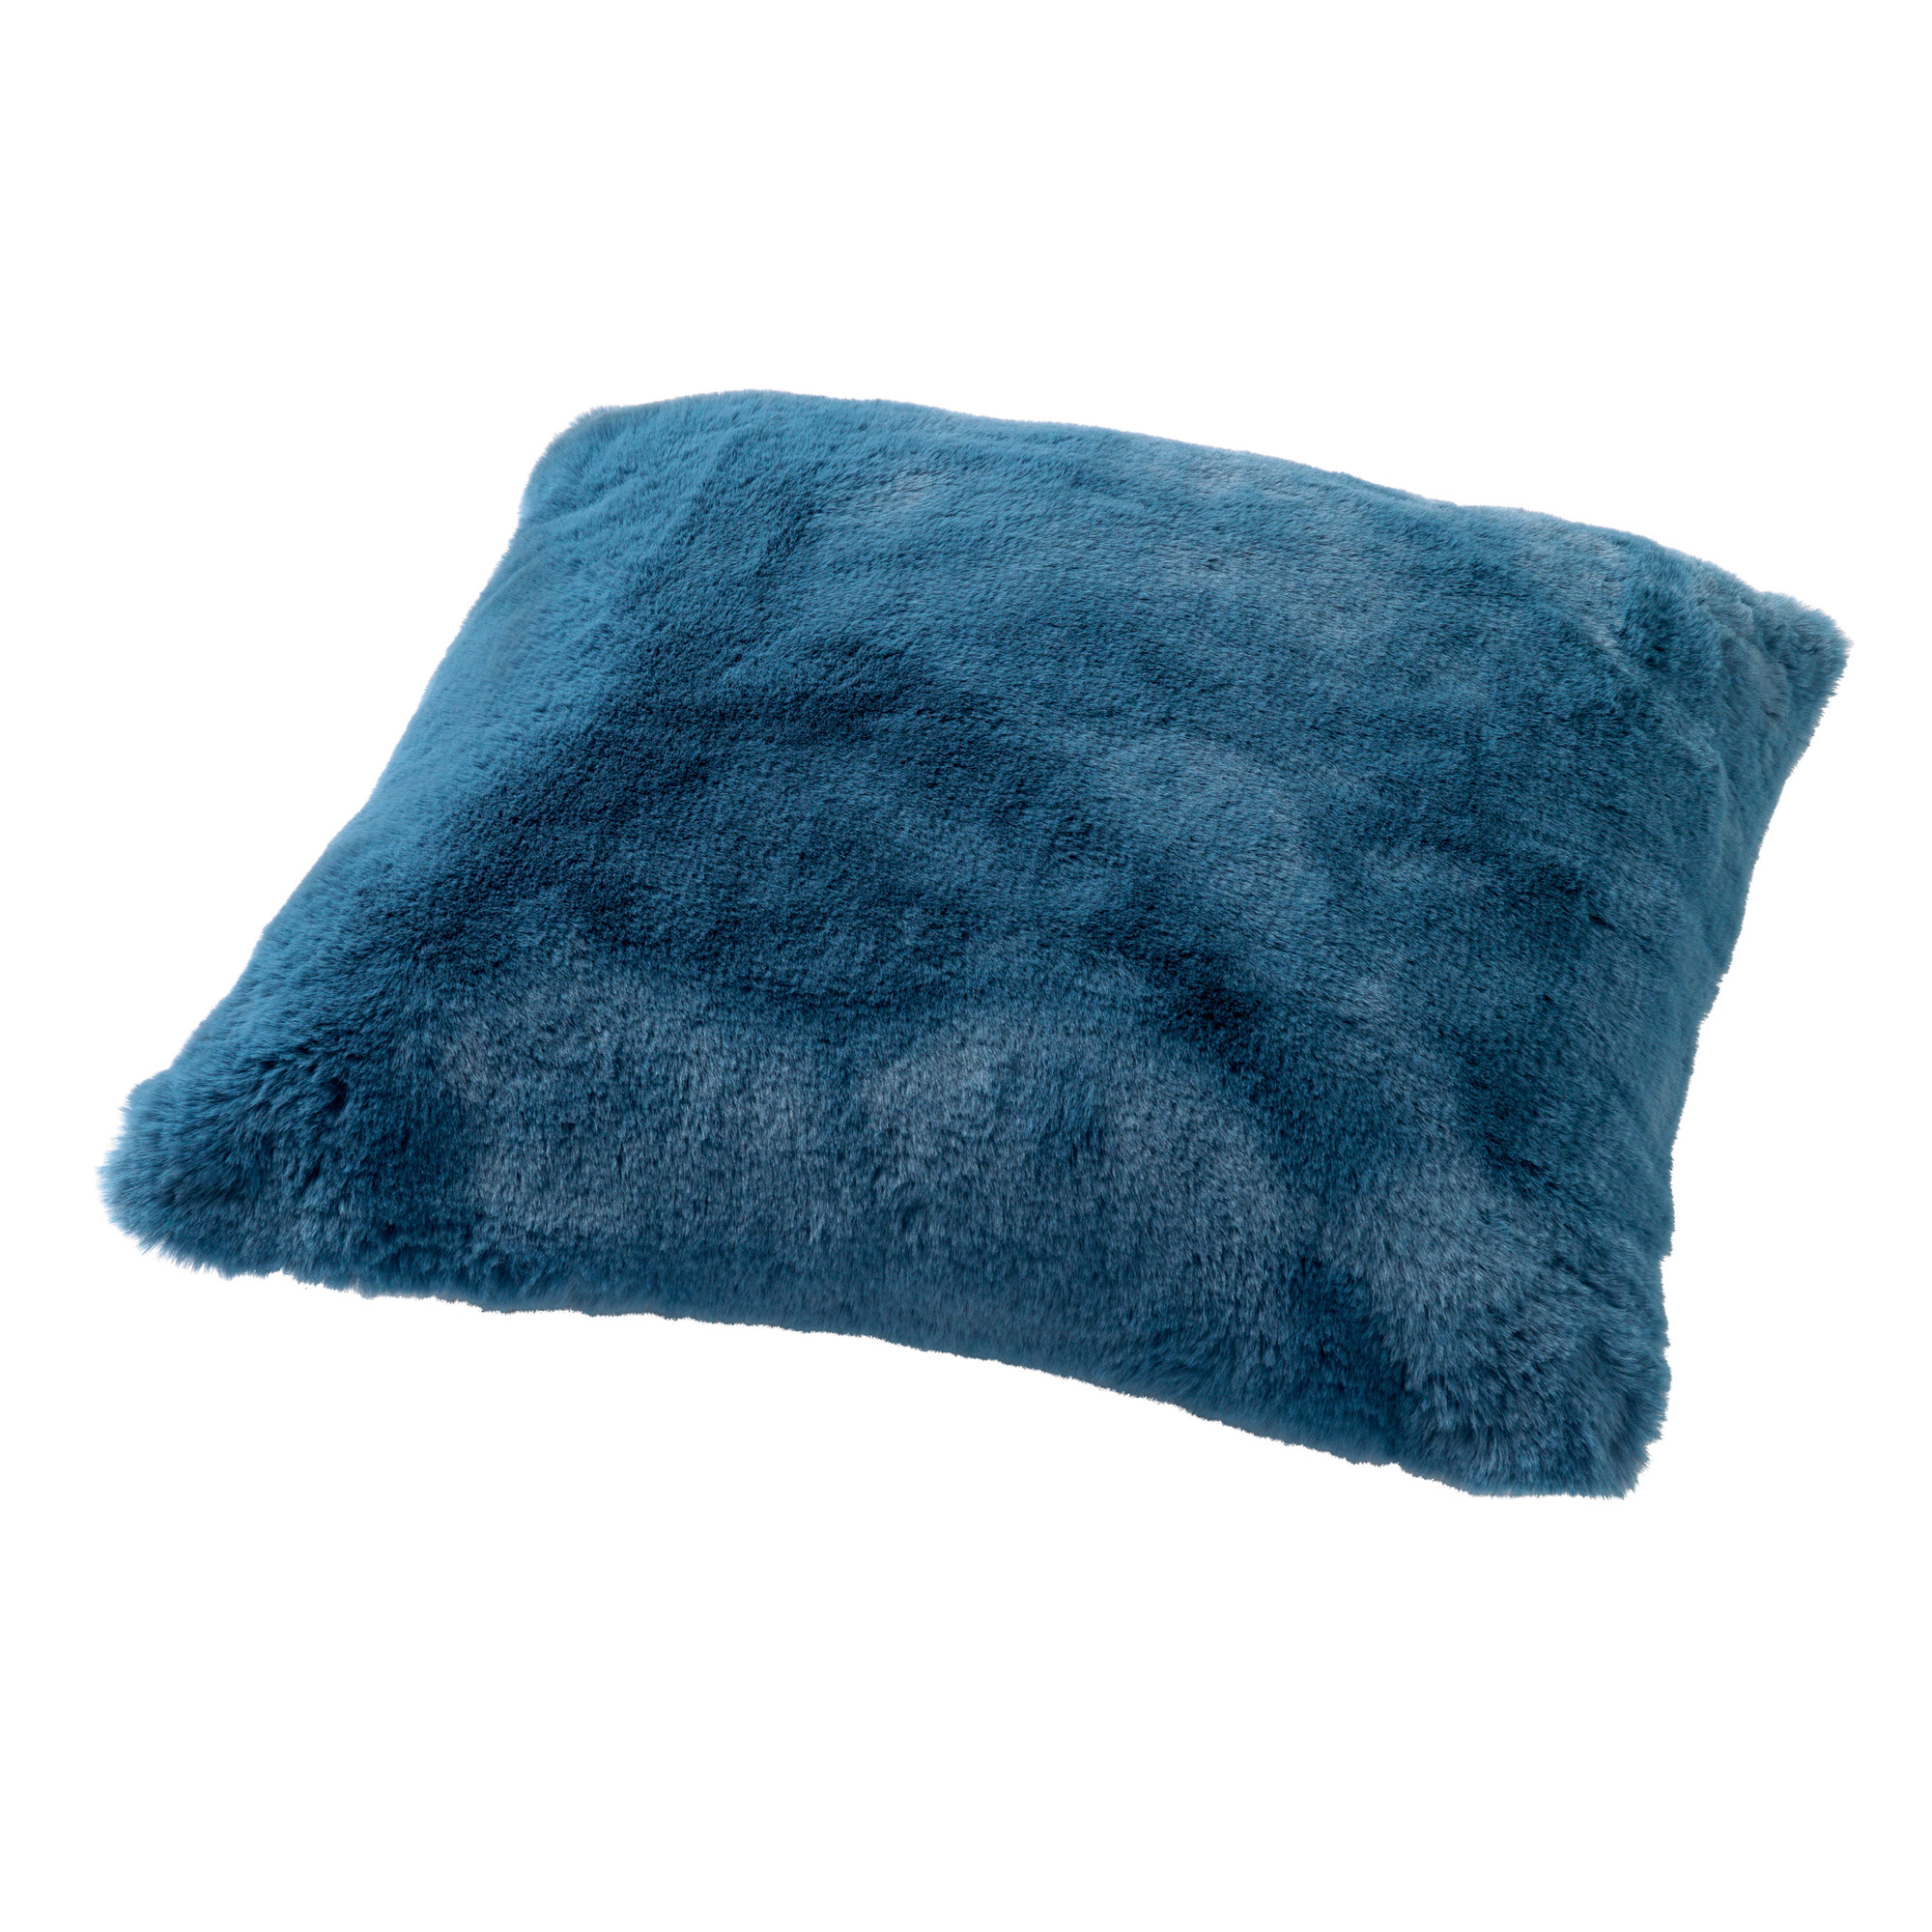 ZAYA - Sierkussen met imitatiebont Provincial Blue 45x45 cm